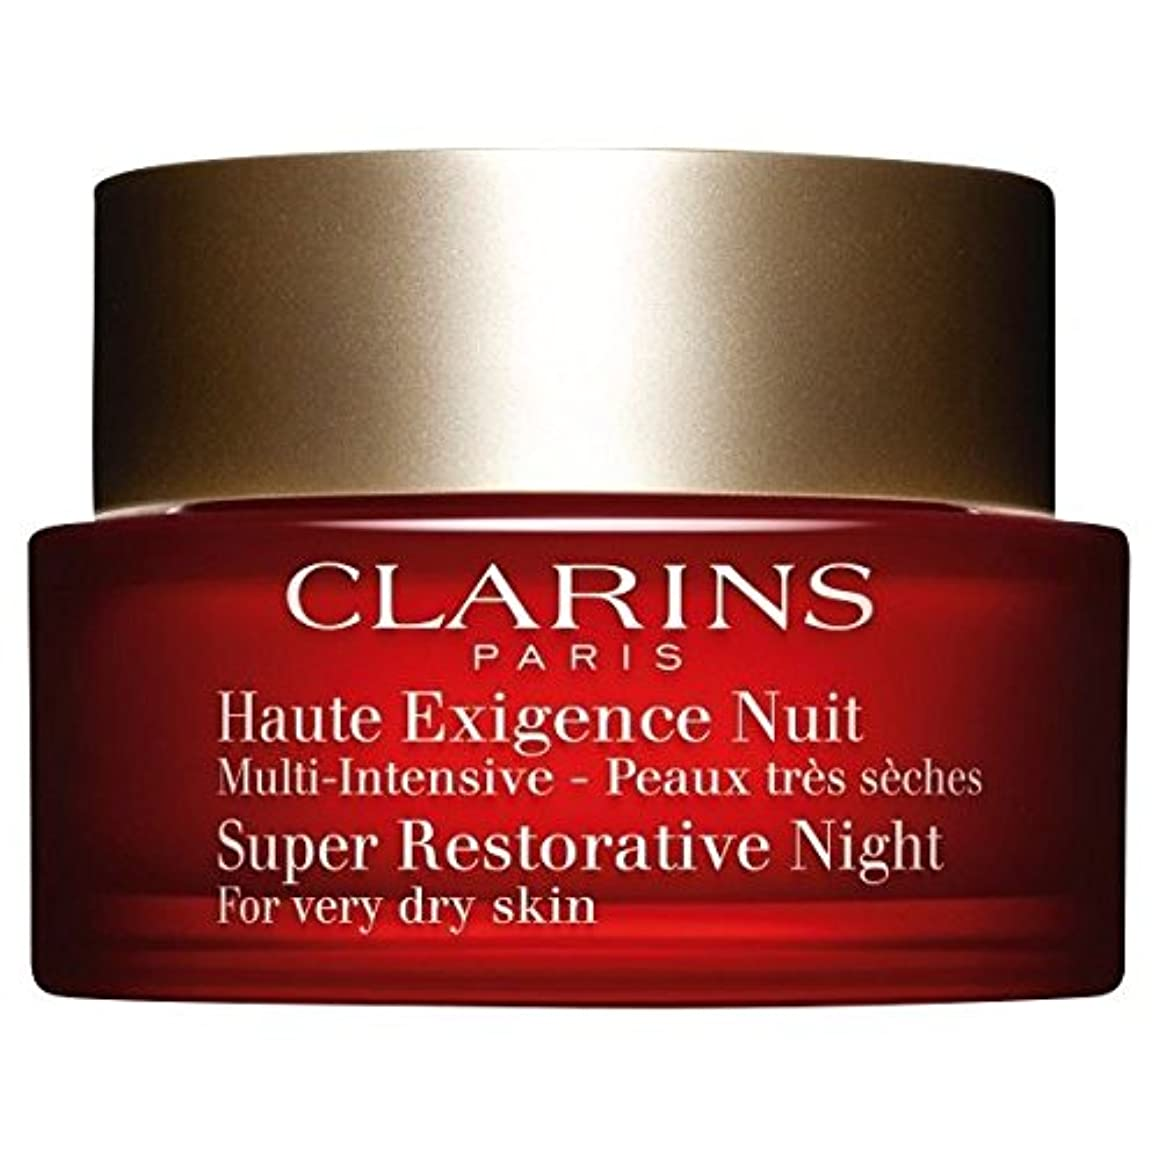 Clarins Super Restorative Night Cream For Very Dry Skin 50ml - Pack of 2